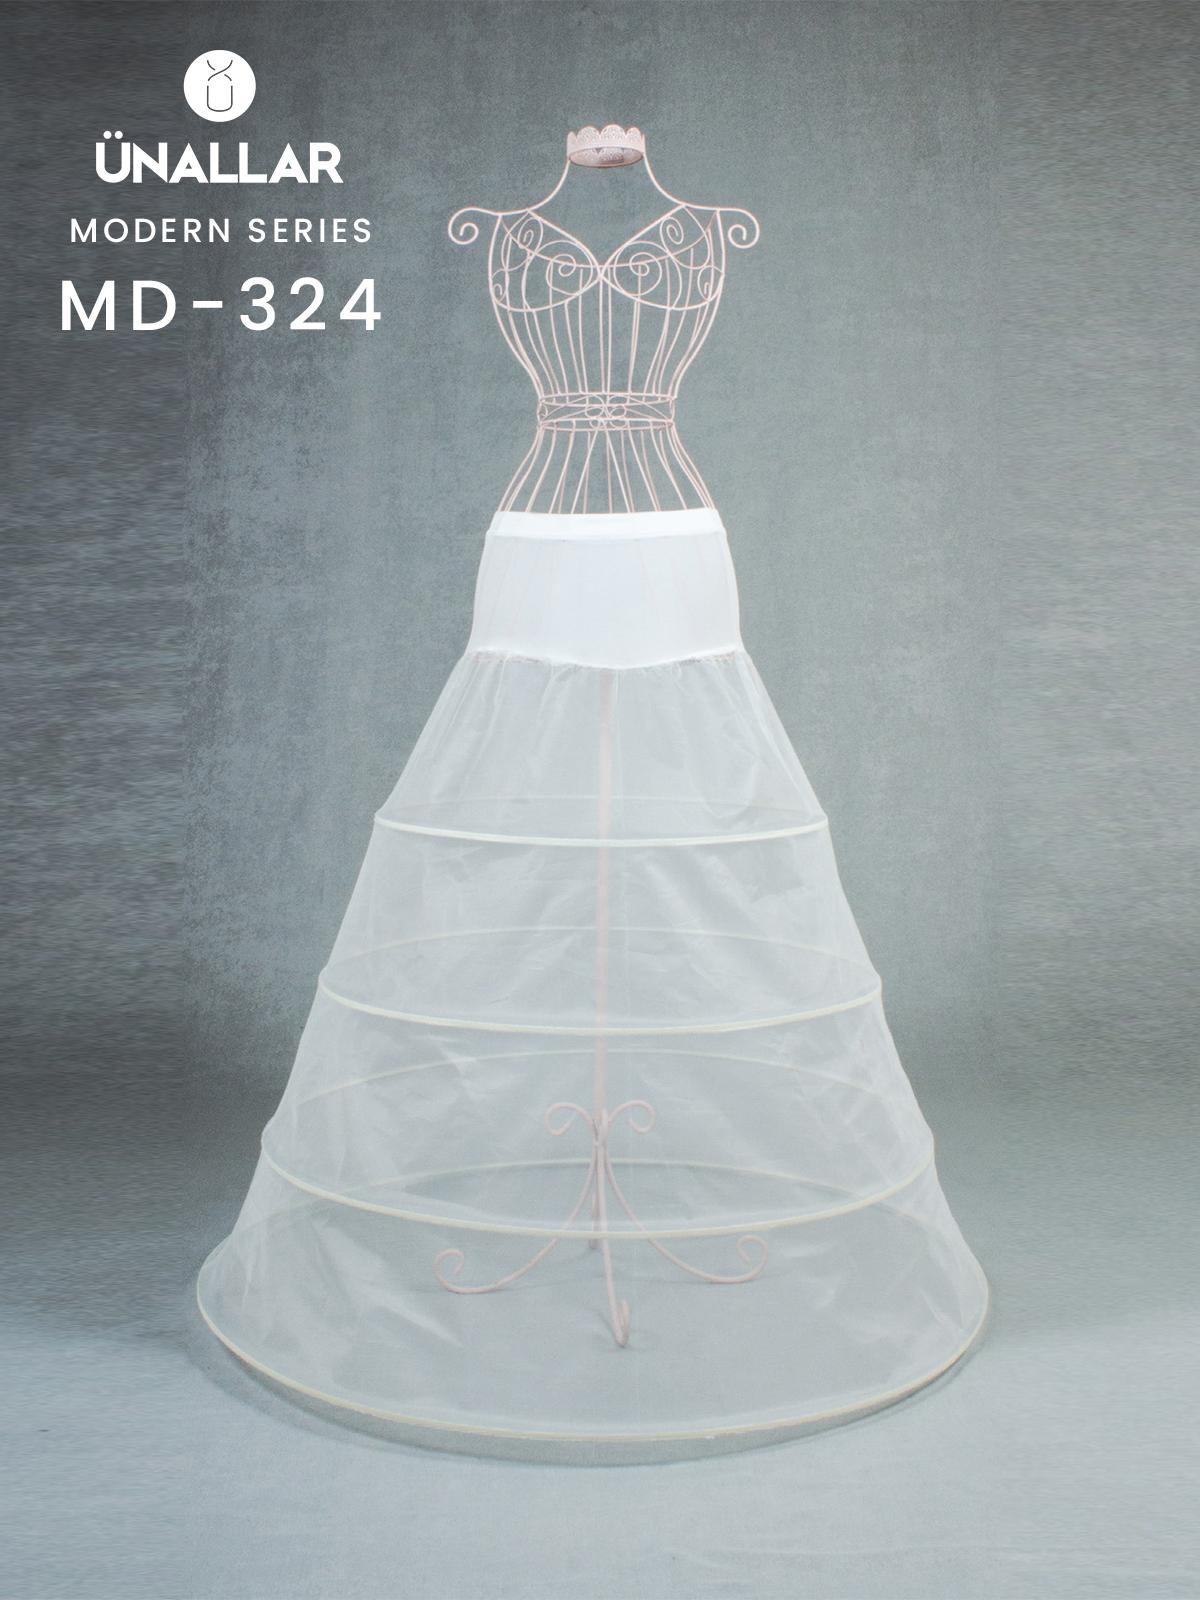 md-324